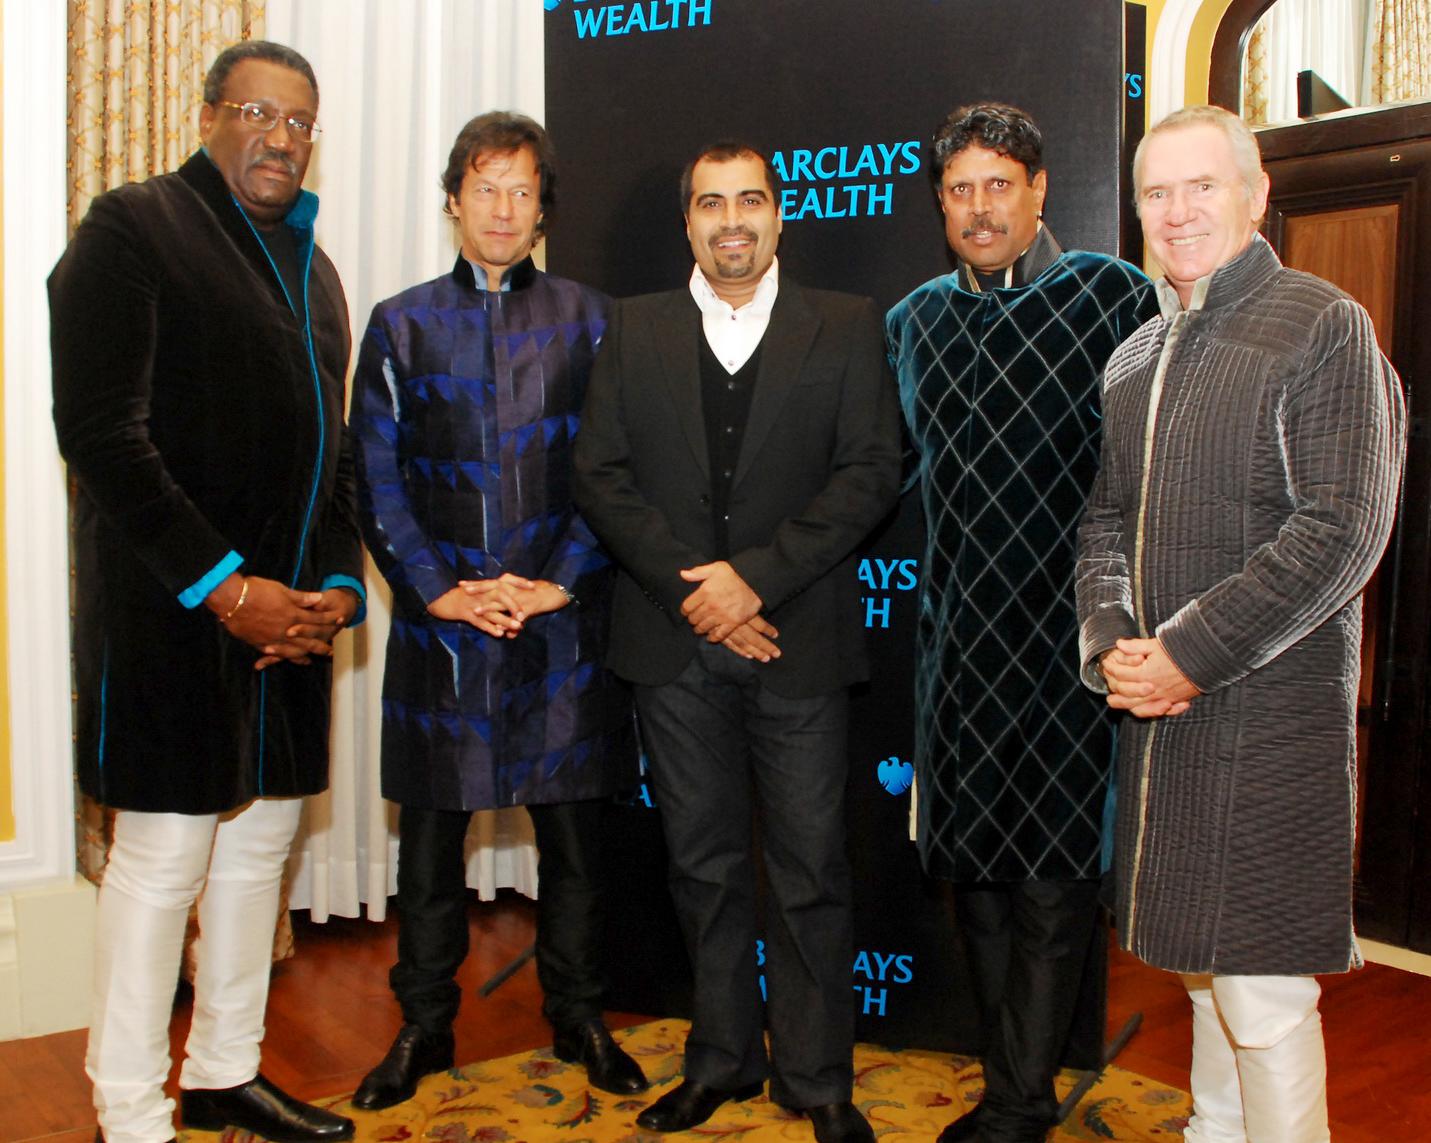 Clive Lloyd, Imran Khan, Shailendra Singh, Kapil Dev, Alan Borde